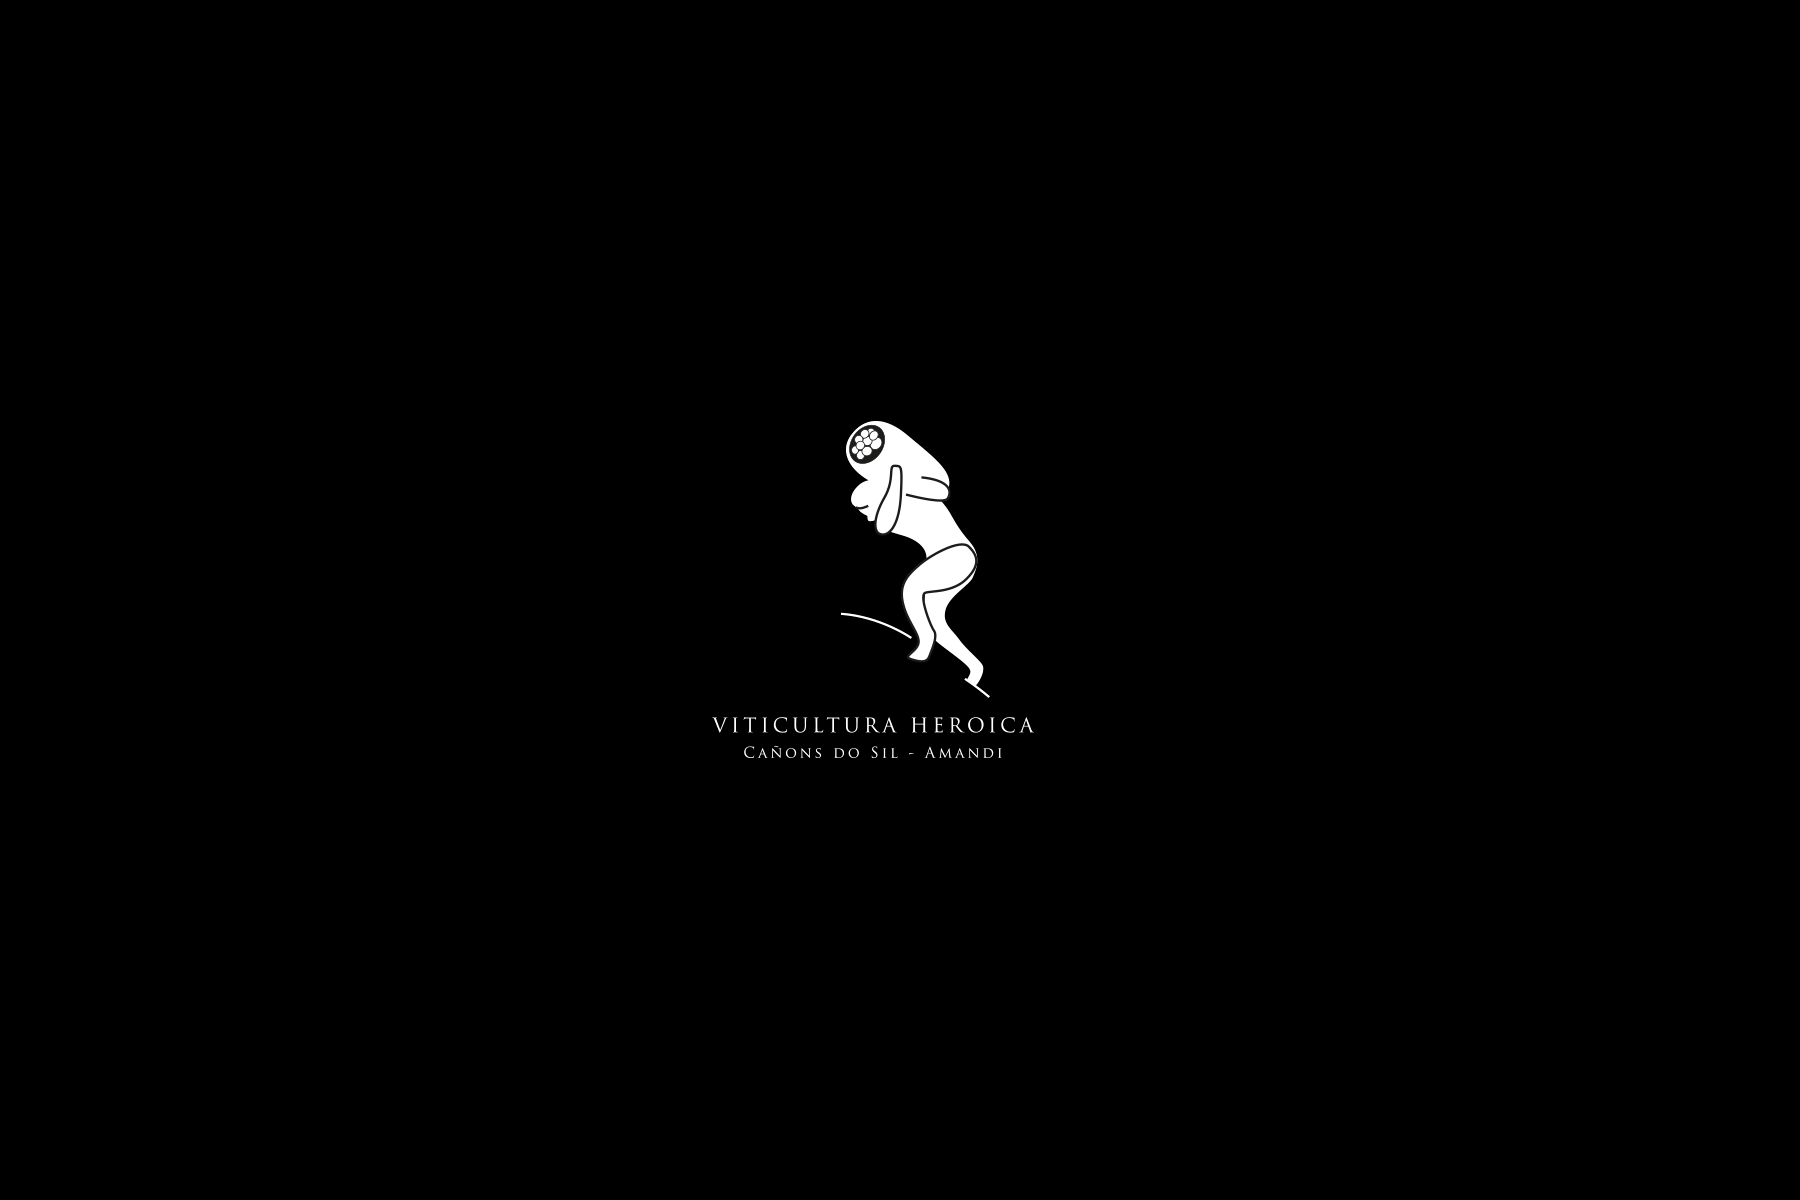 Logo Viticultura Heróica en contratipo